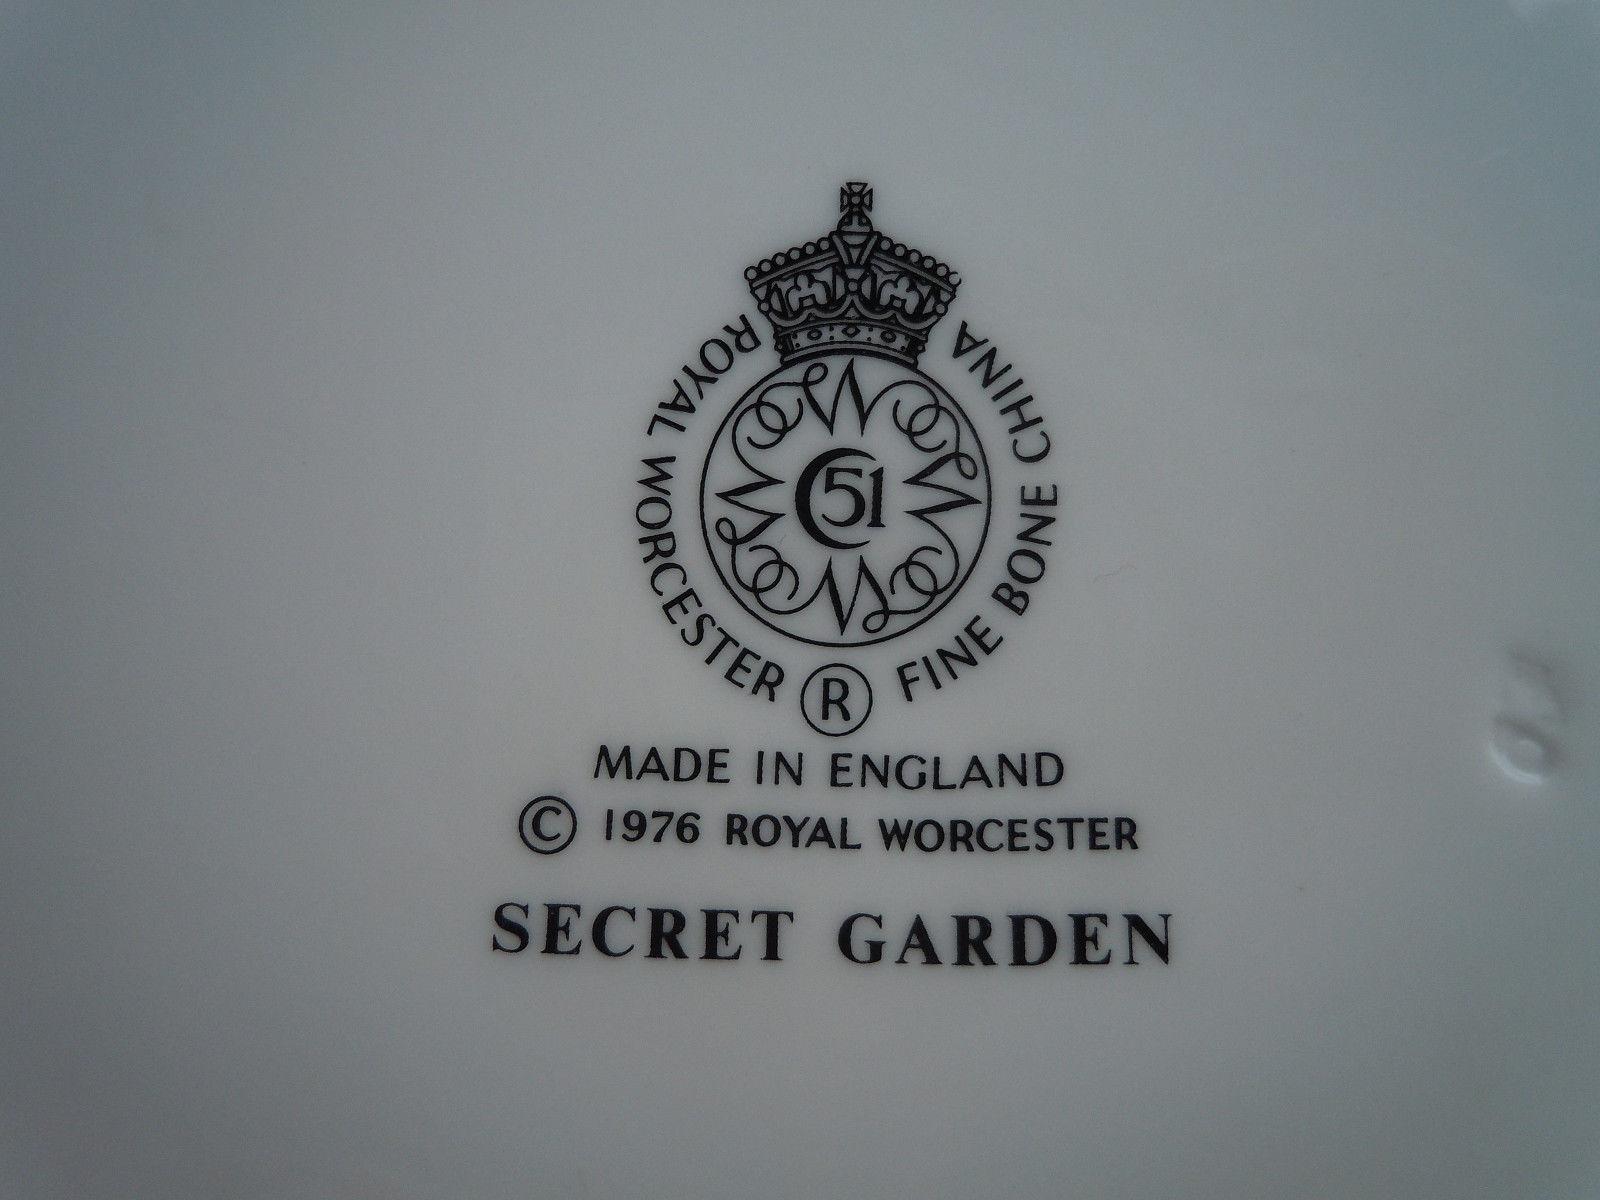 Royal Worcester Secret Garden Cup and Saucer